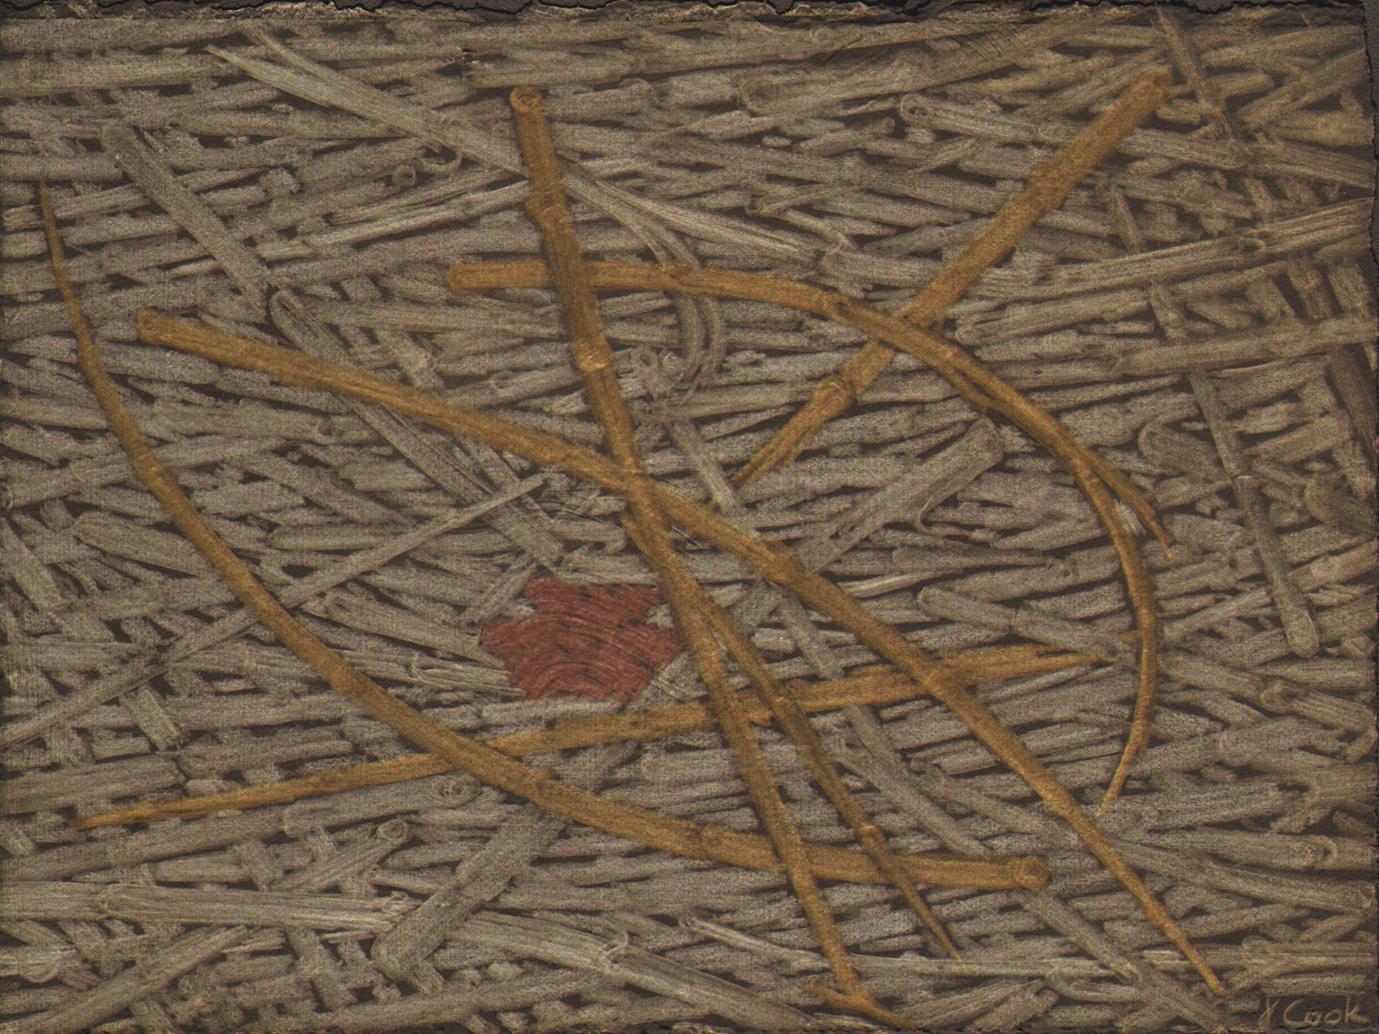 Marsh Wrack, metalpoint, JeannineCook artist